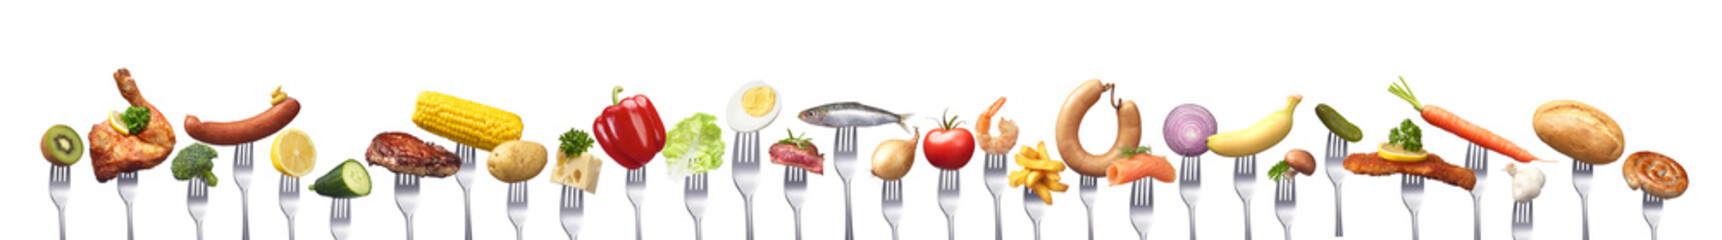 Allerlei Lebensmittel